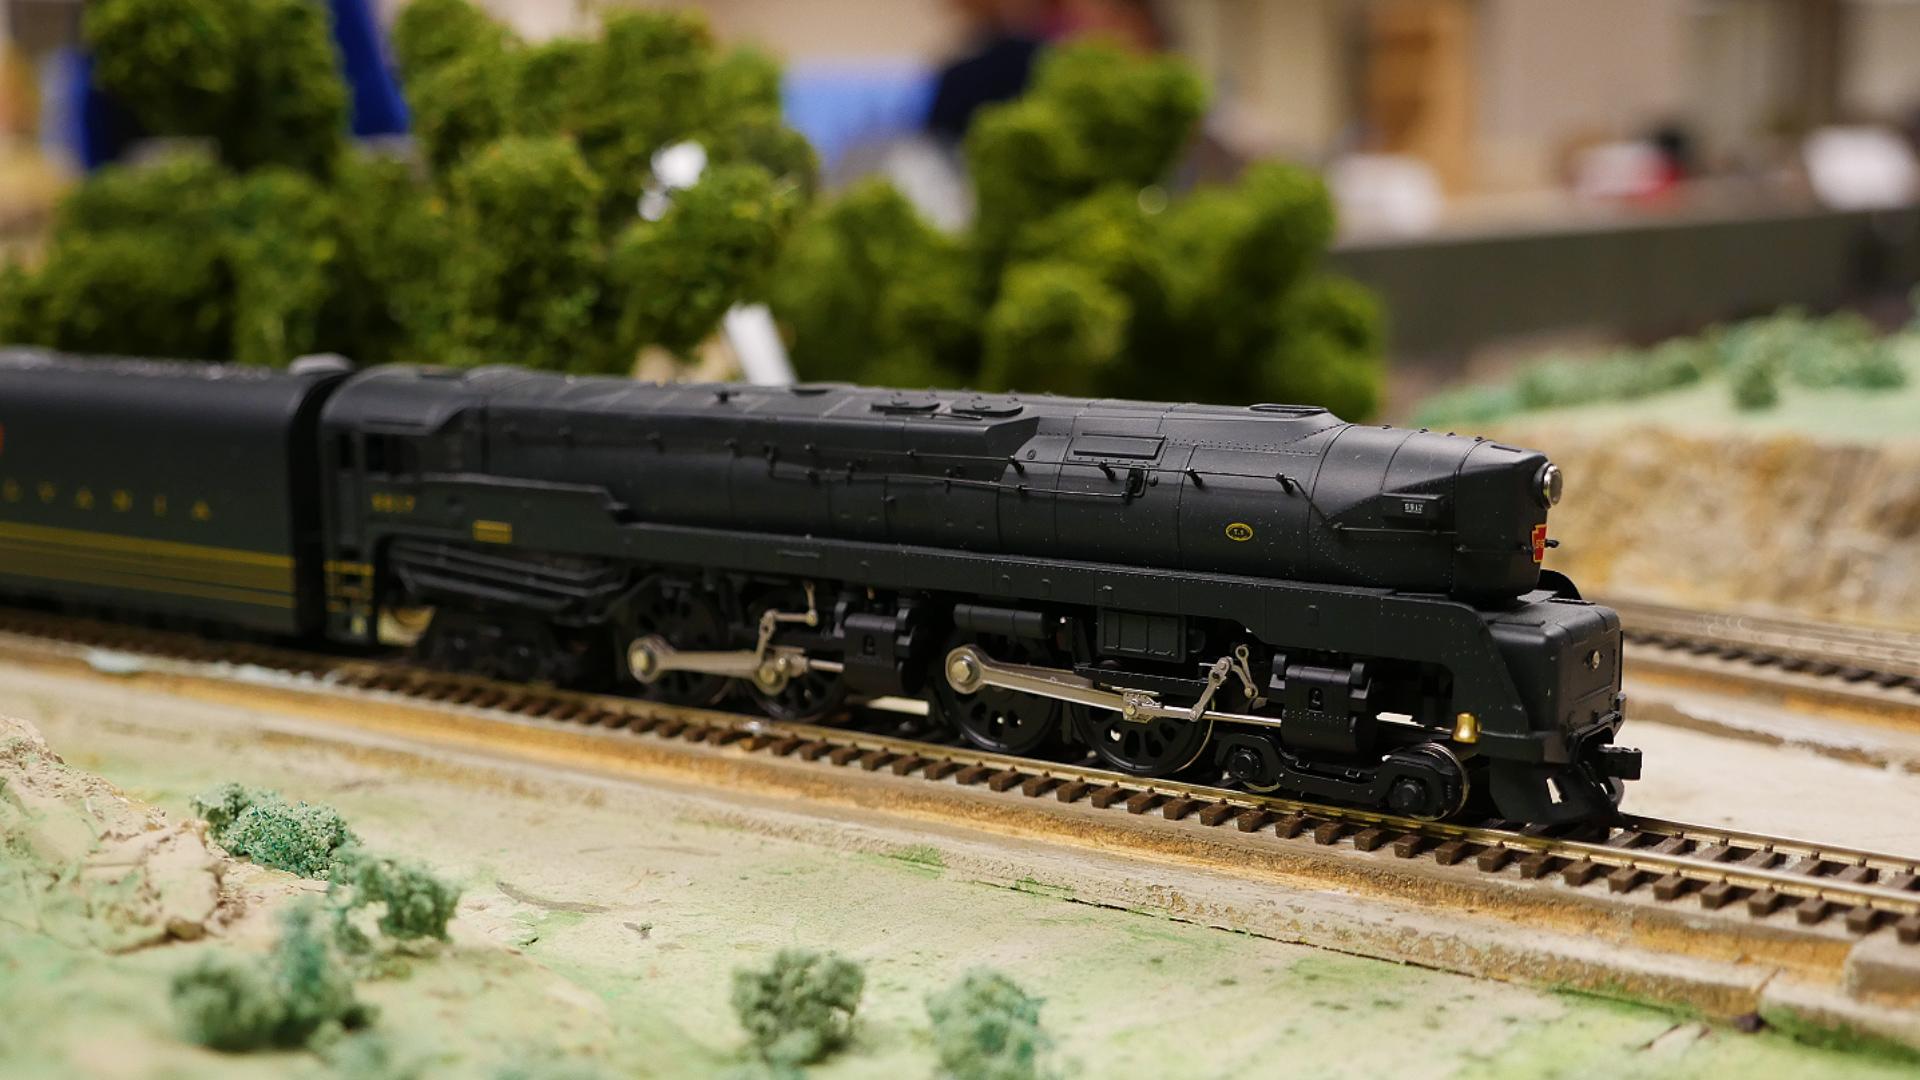 Hintergrundbilder : Show, Kamera, Eisenbahn, Reise, Berg, Farbe ...